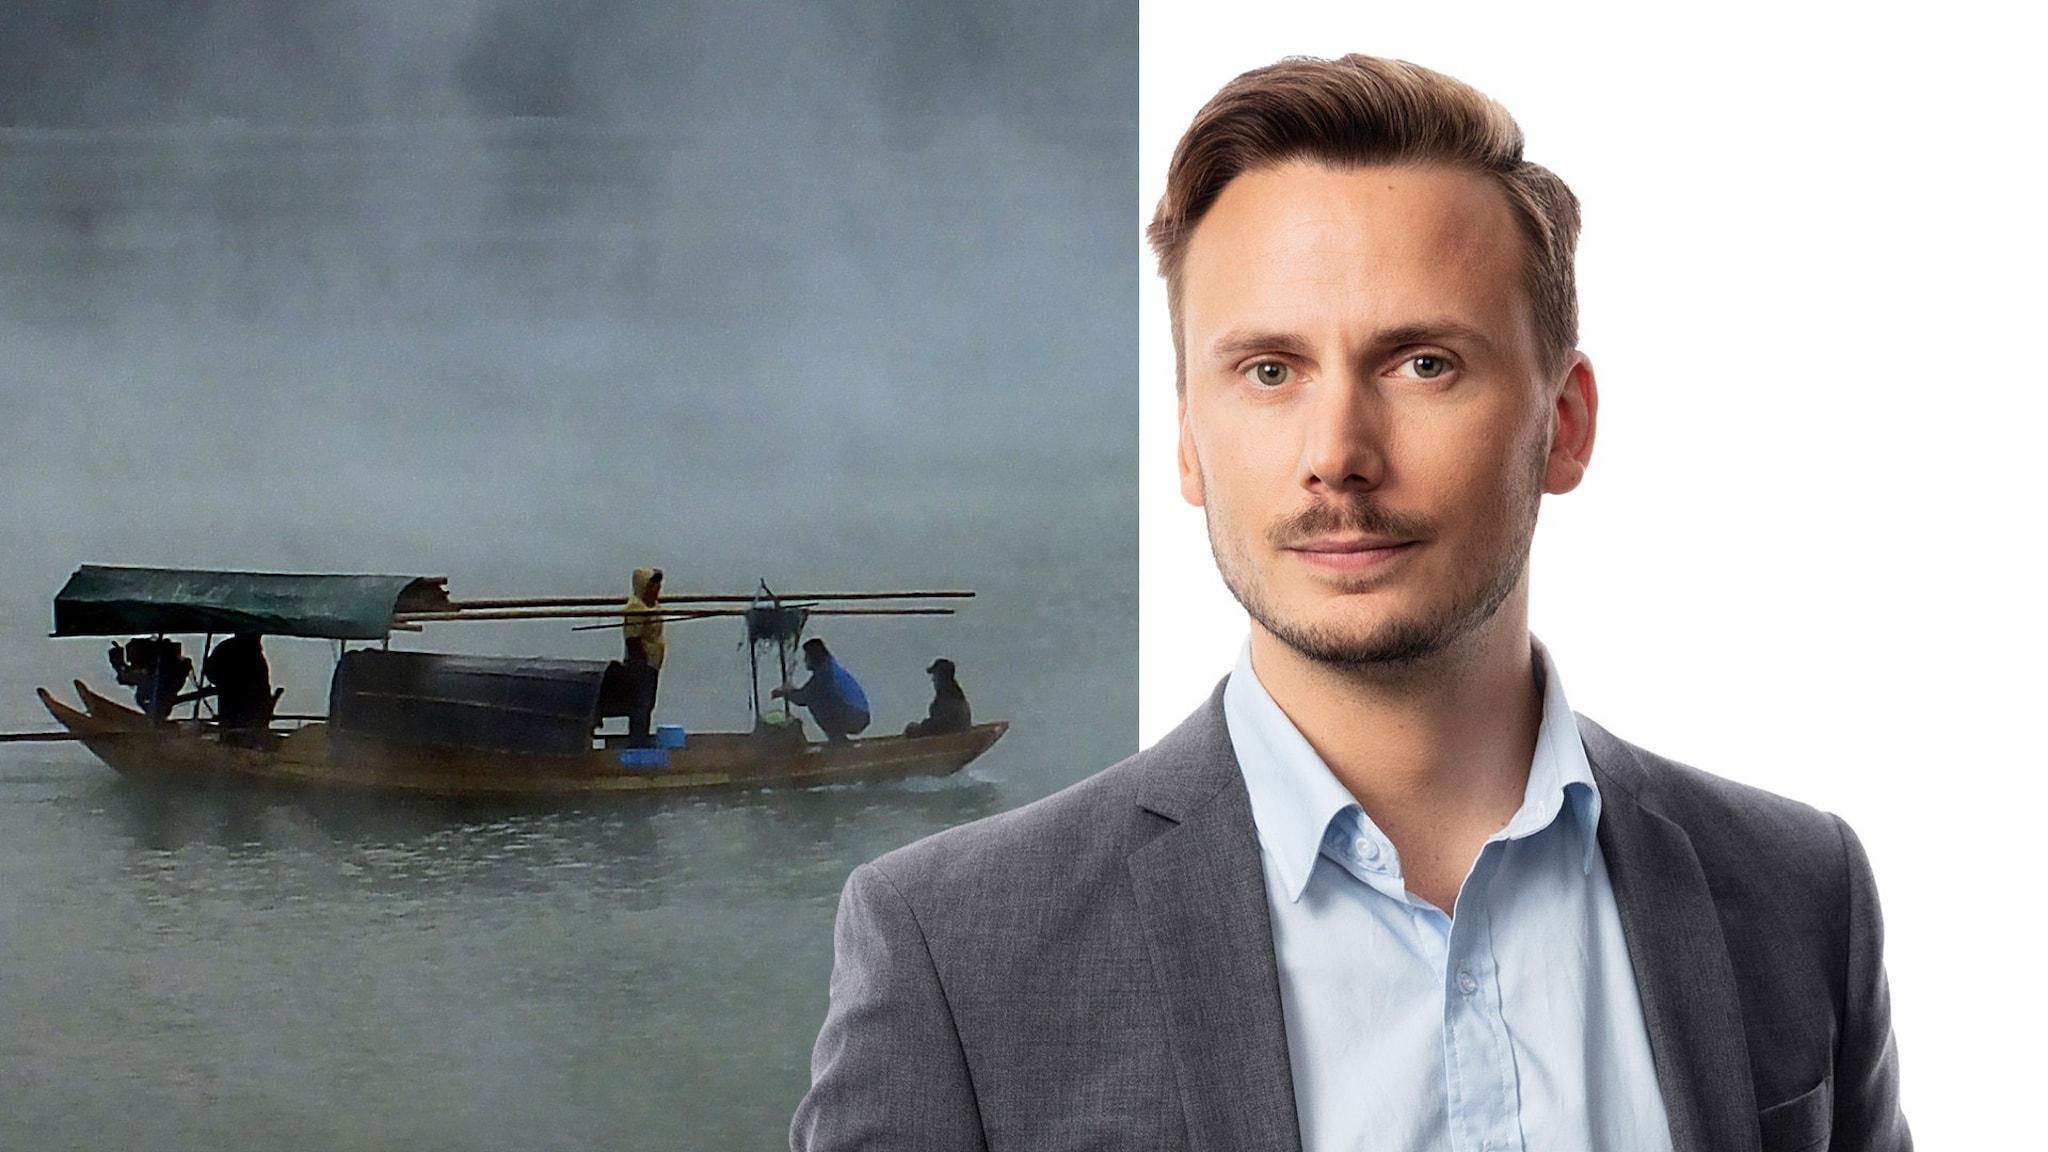 båt på flod, Björn Bjurberg.